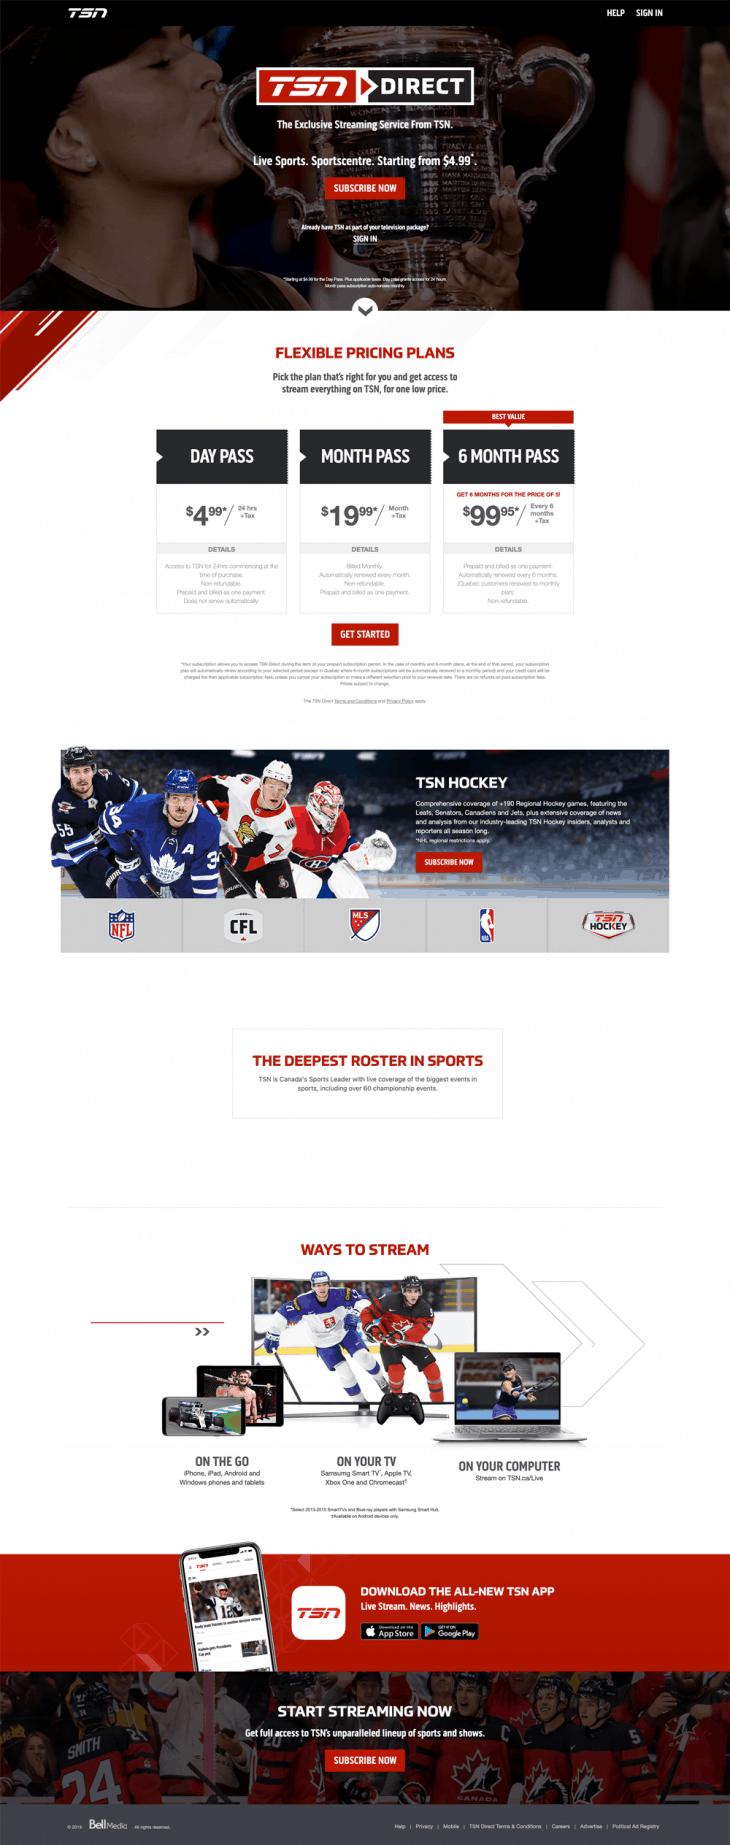 Toronto Web Design on laptop image